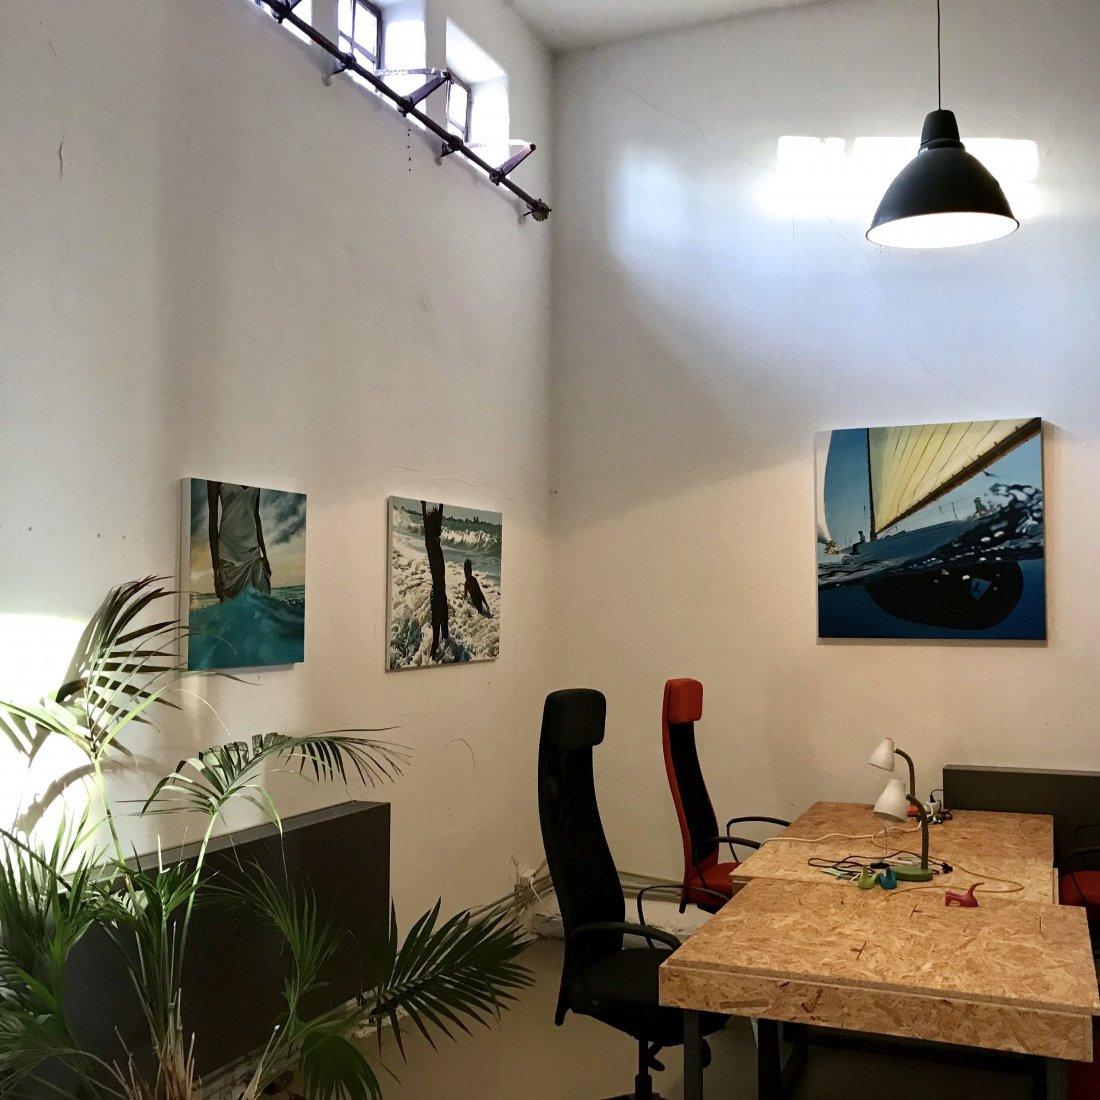 antoinerenault-amsterdam-exhibition-art-thethinkinghut-2